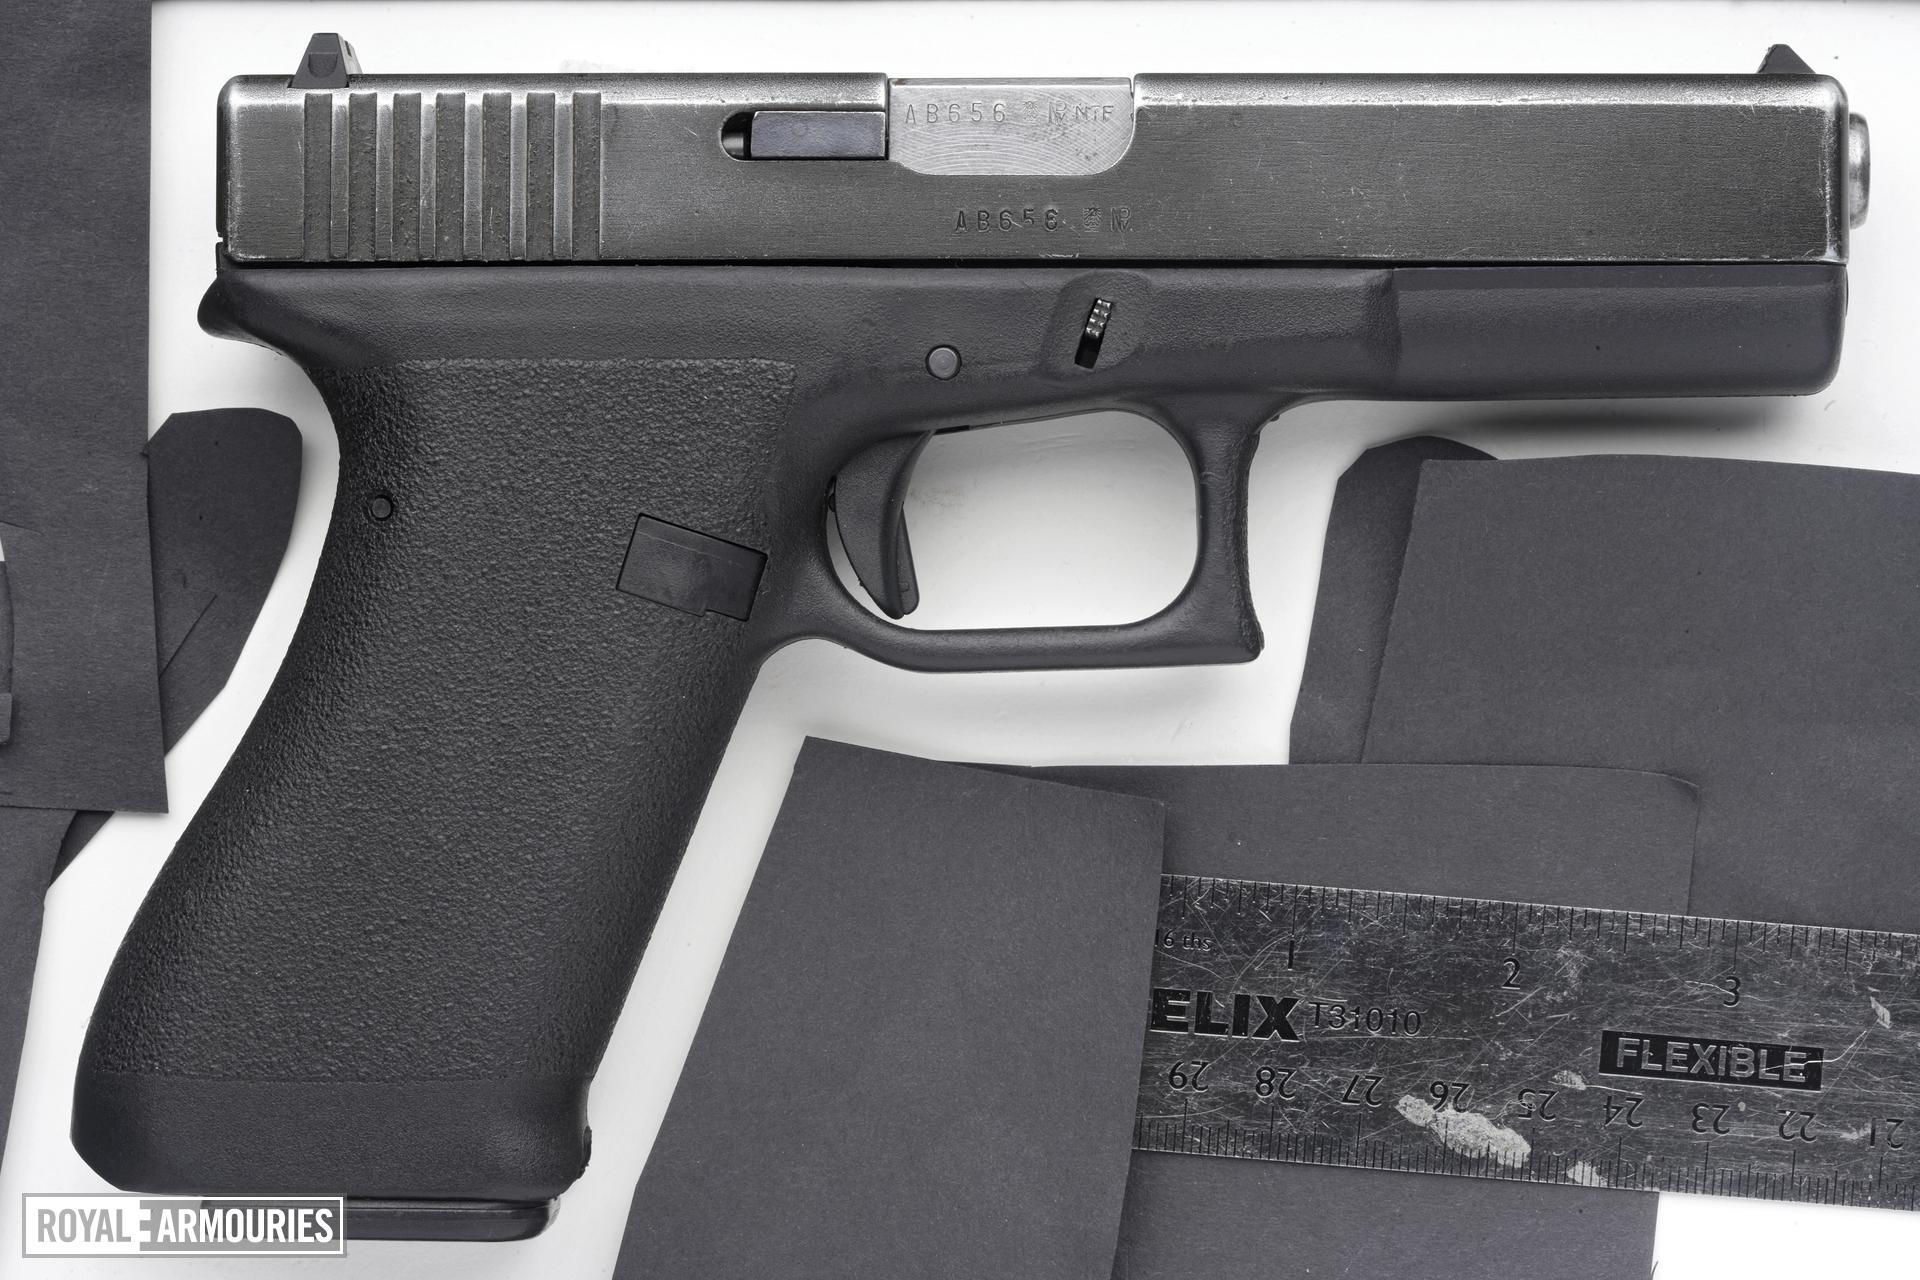 Centrefire self-loading pistol - Glock 17 Generation 1